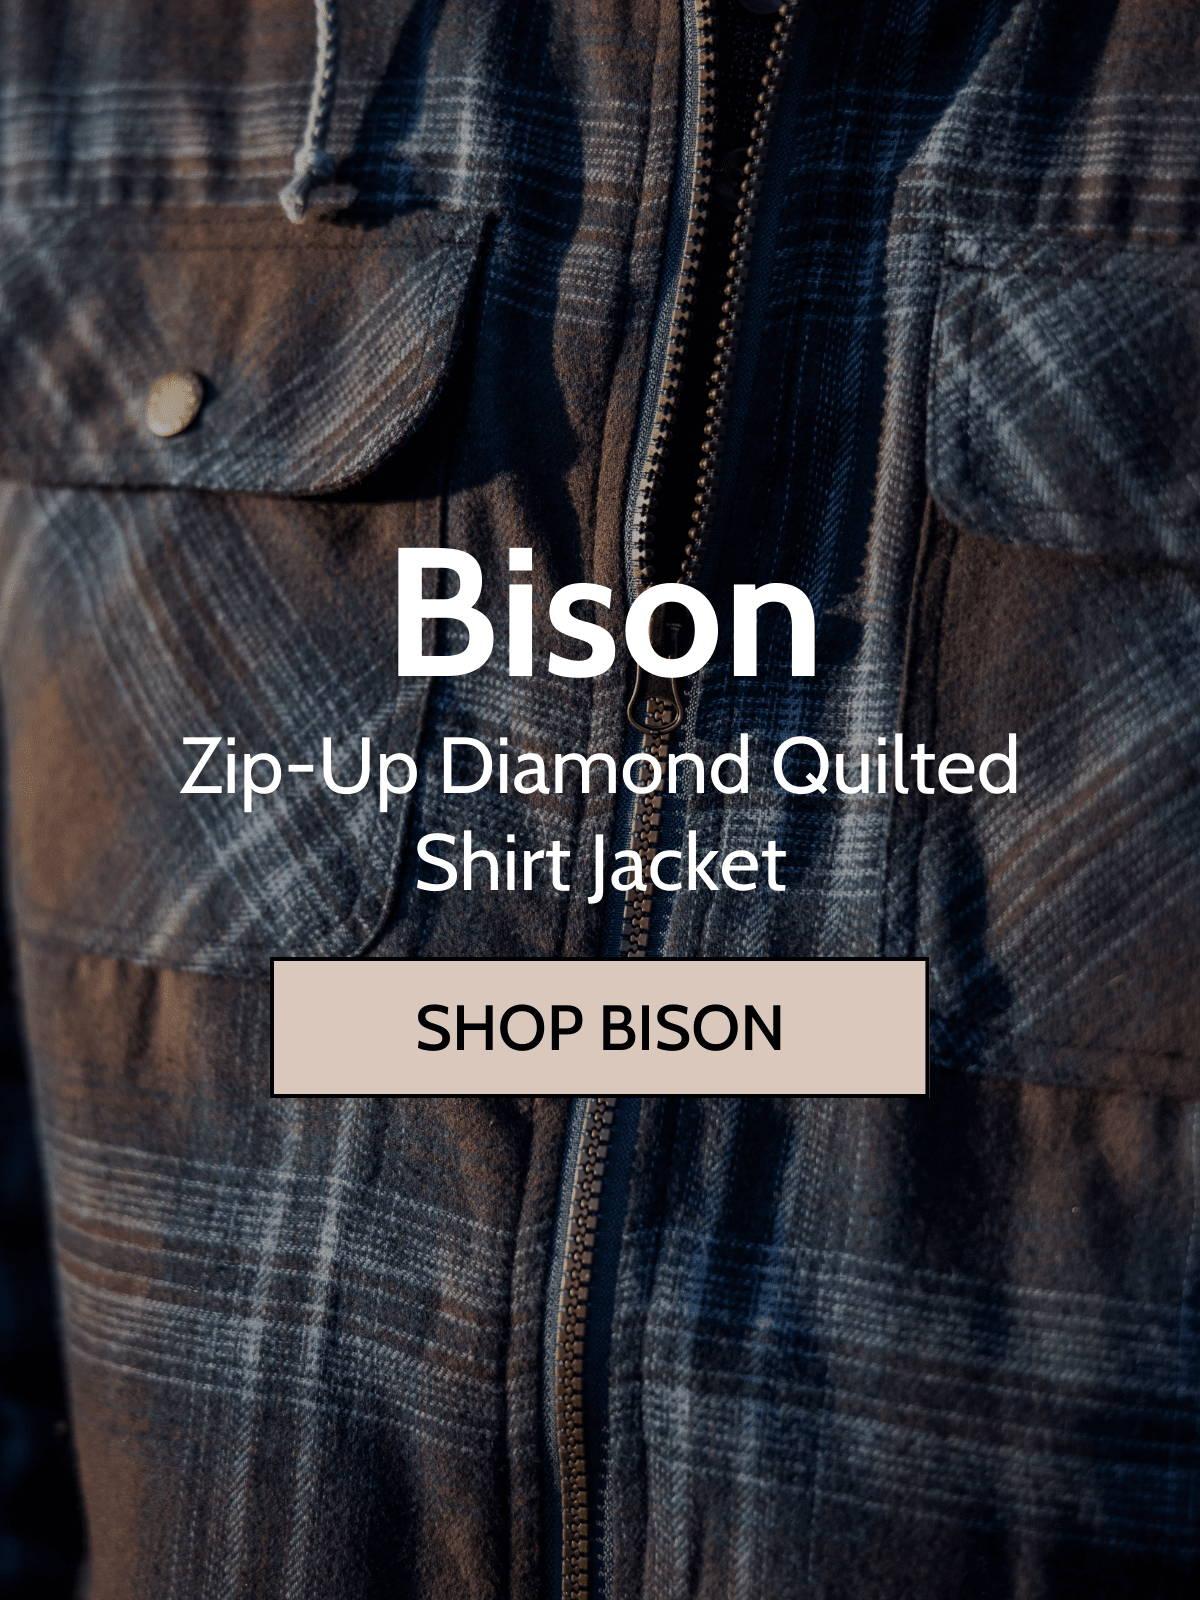 Canyon guide bison shirt jacket